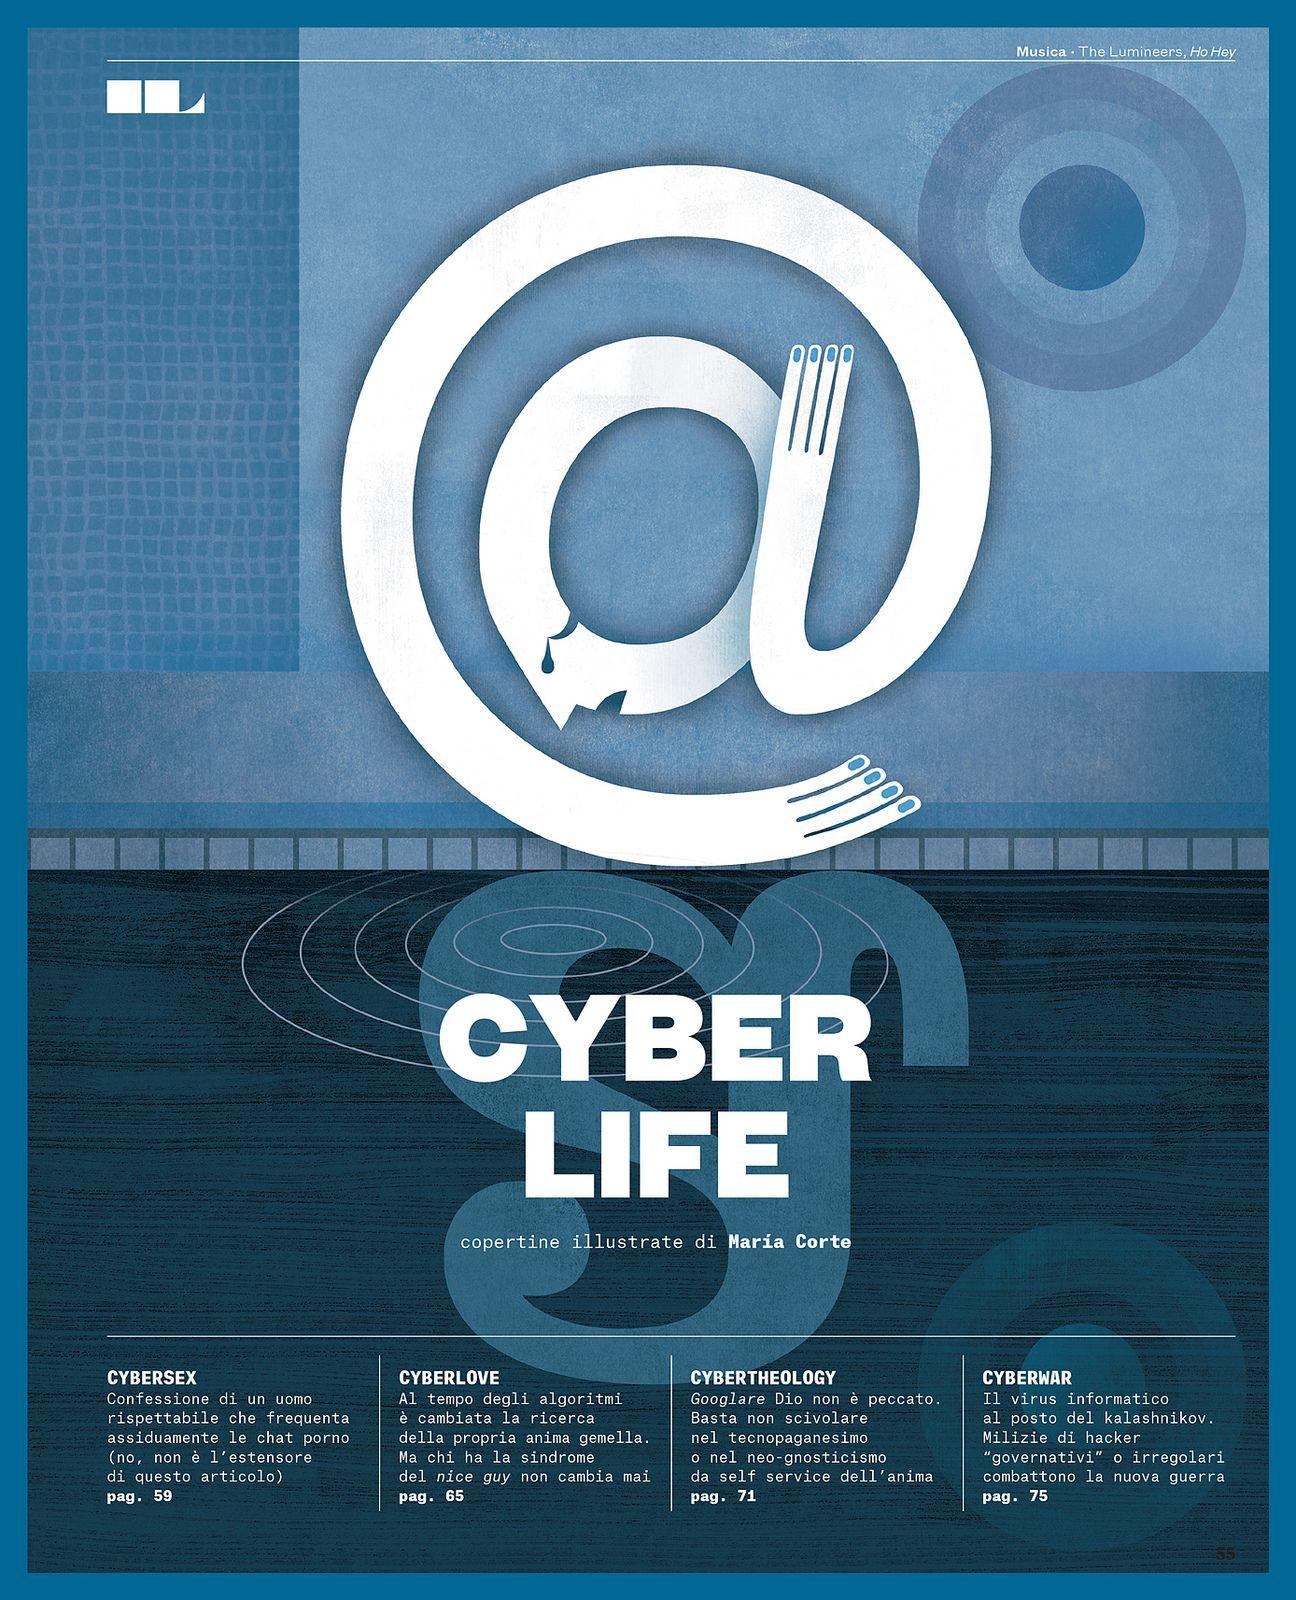 Cyber Life | 相片擁有者 Francesco Franchi